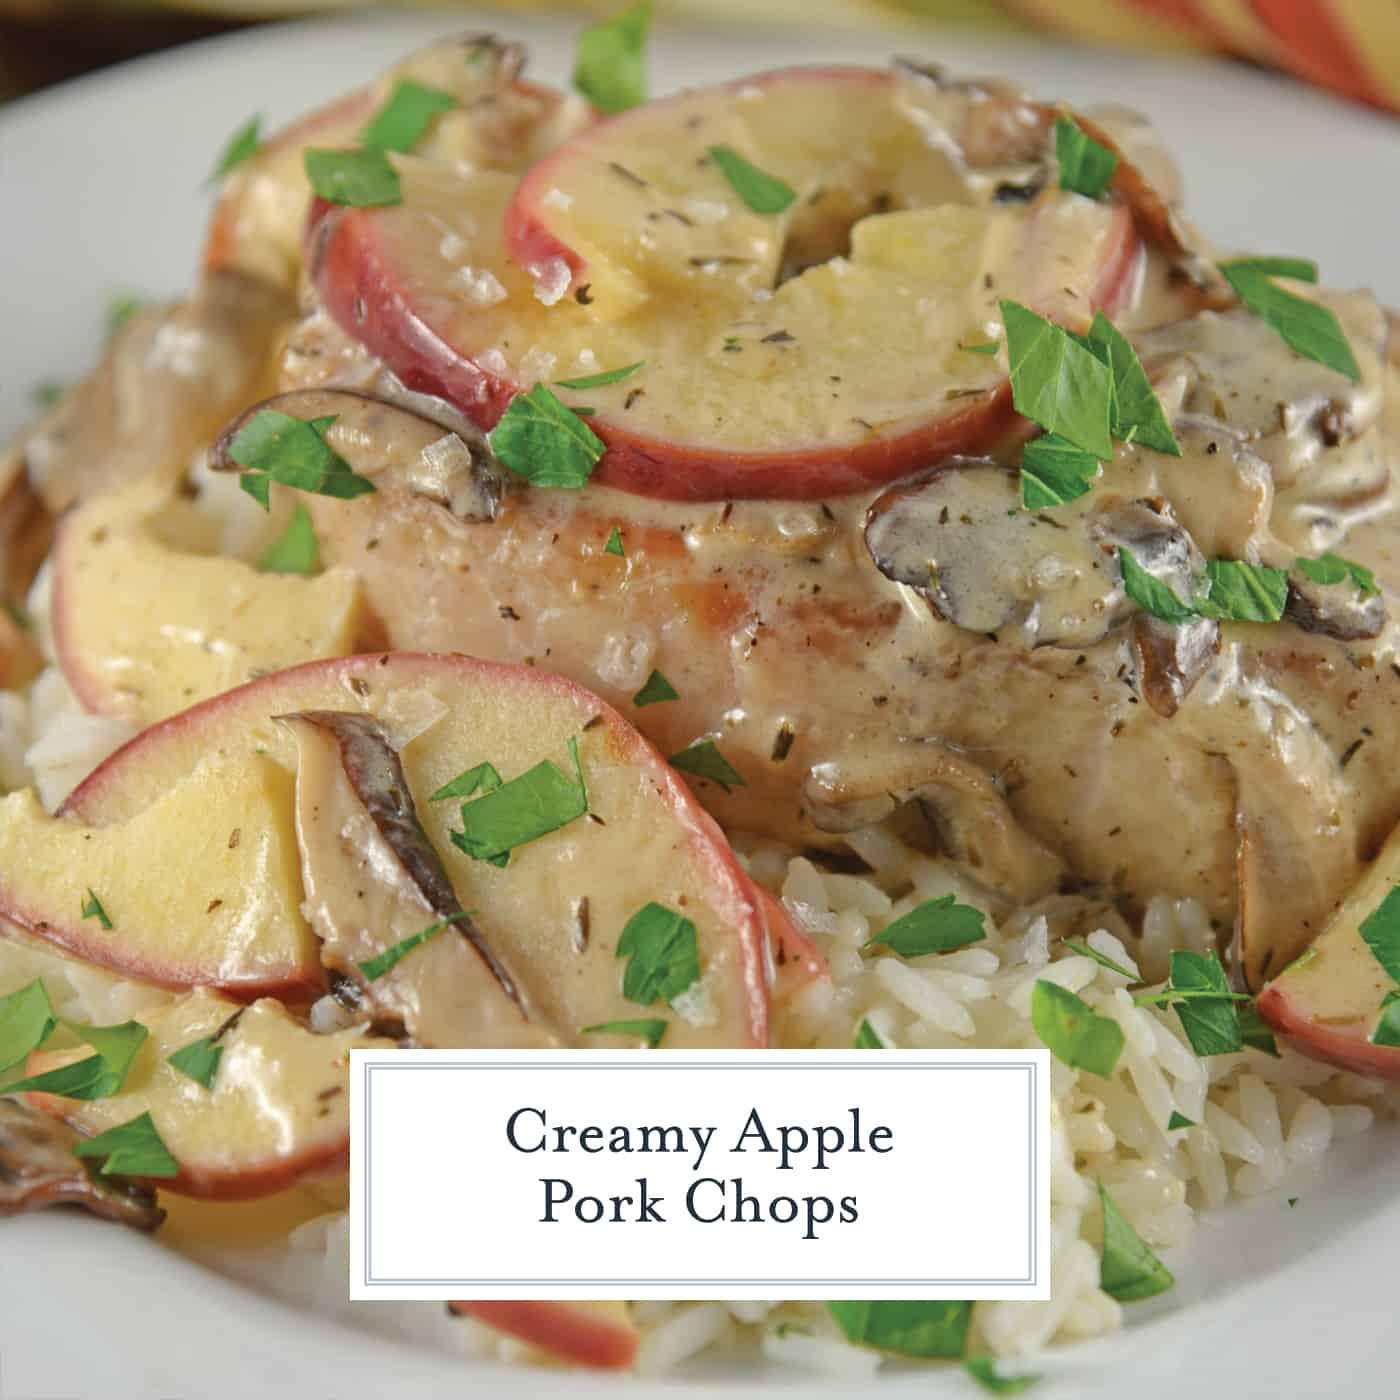 Creamy Apple Pork Chops